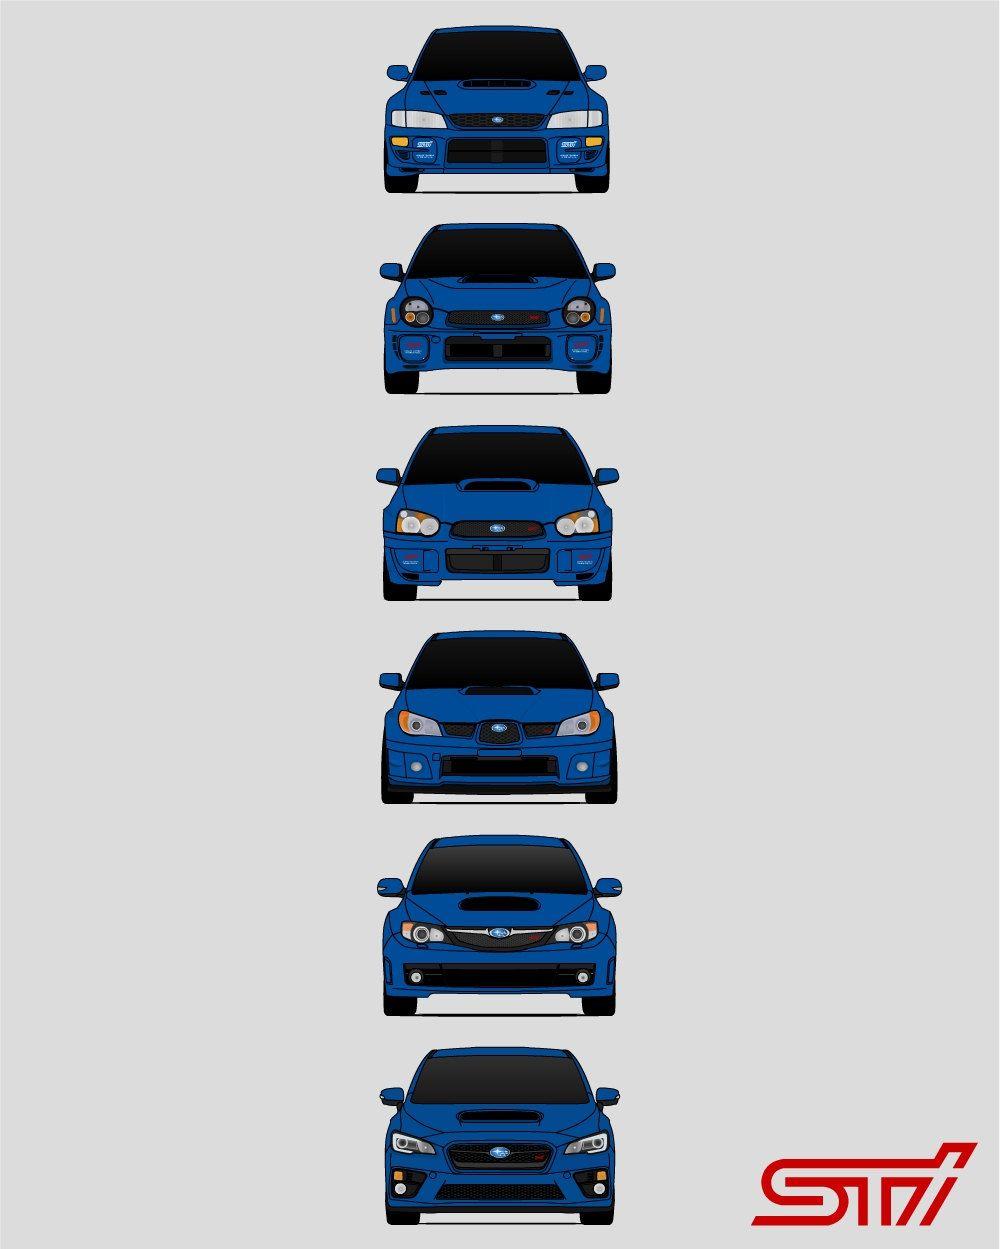 Subaru STI Poster / Subaru Poster / STI Poster / Subaru